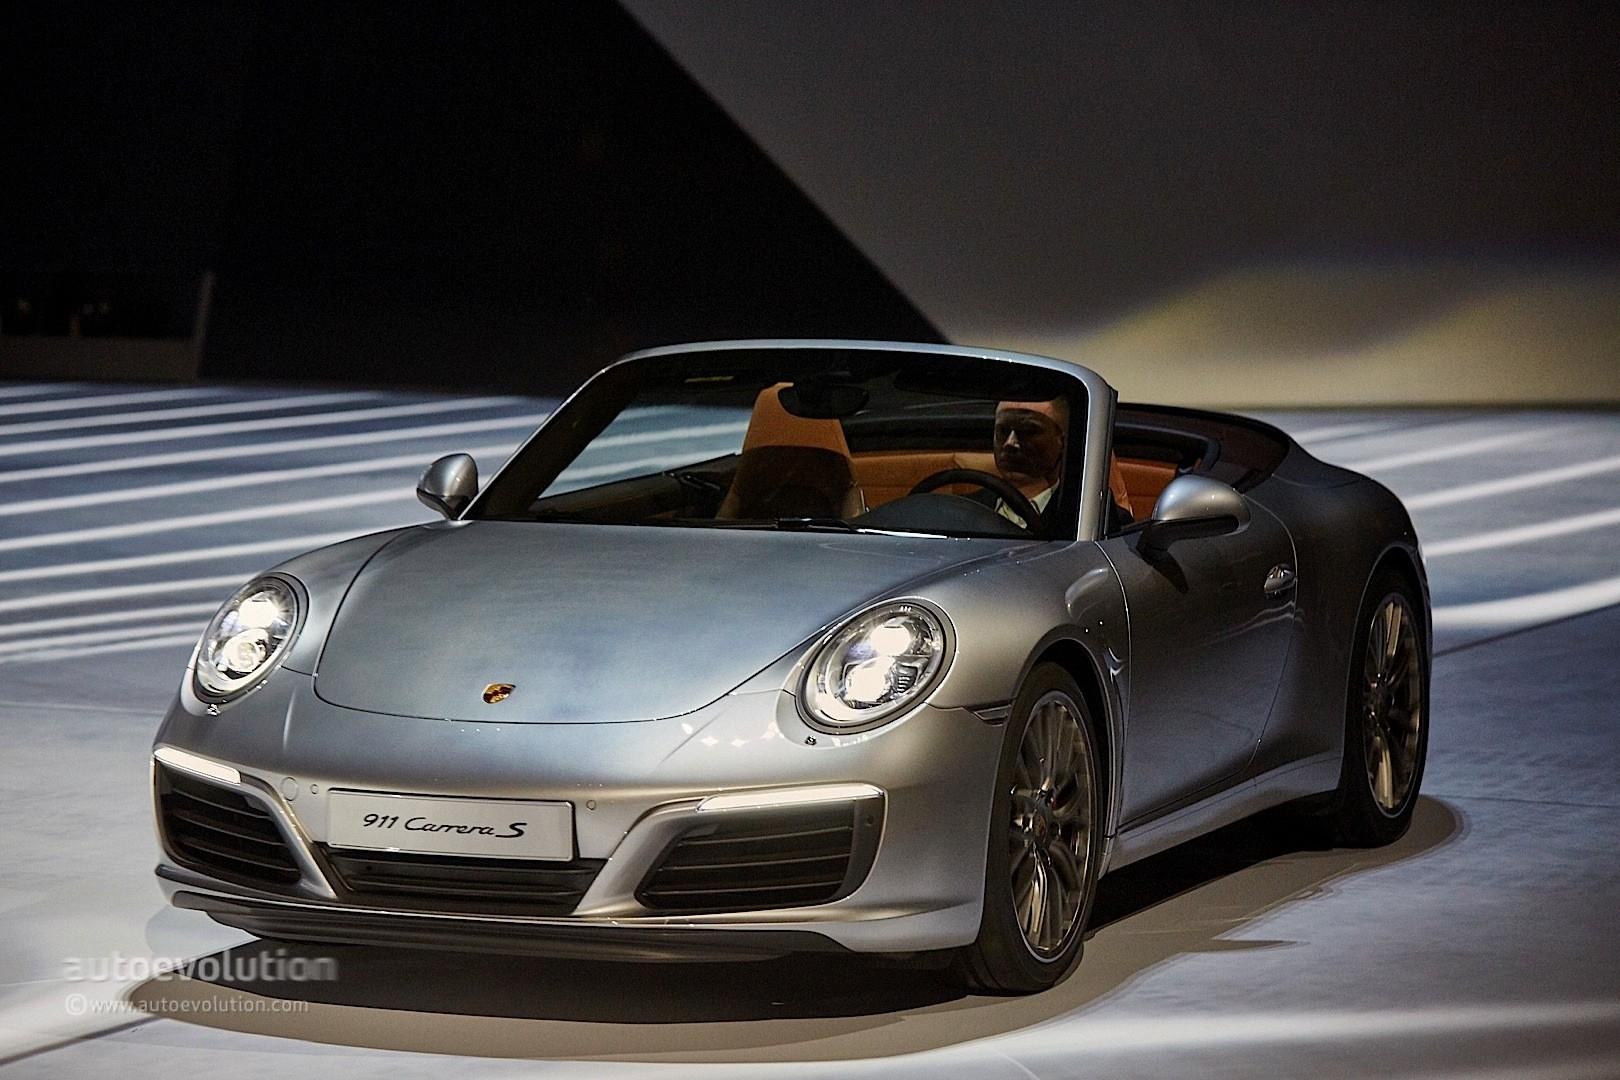 2017 Porsche Cayenne Gts >> 2017 Porsche 911 Feels Like an Old-School Turbo Machine in Frankfurt - Live Photos - autoevolution